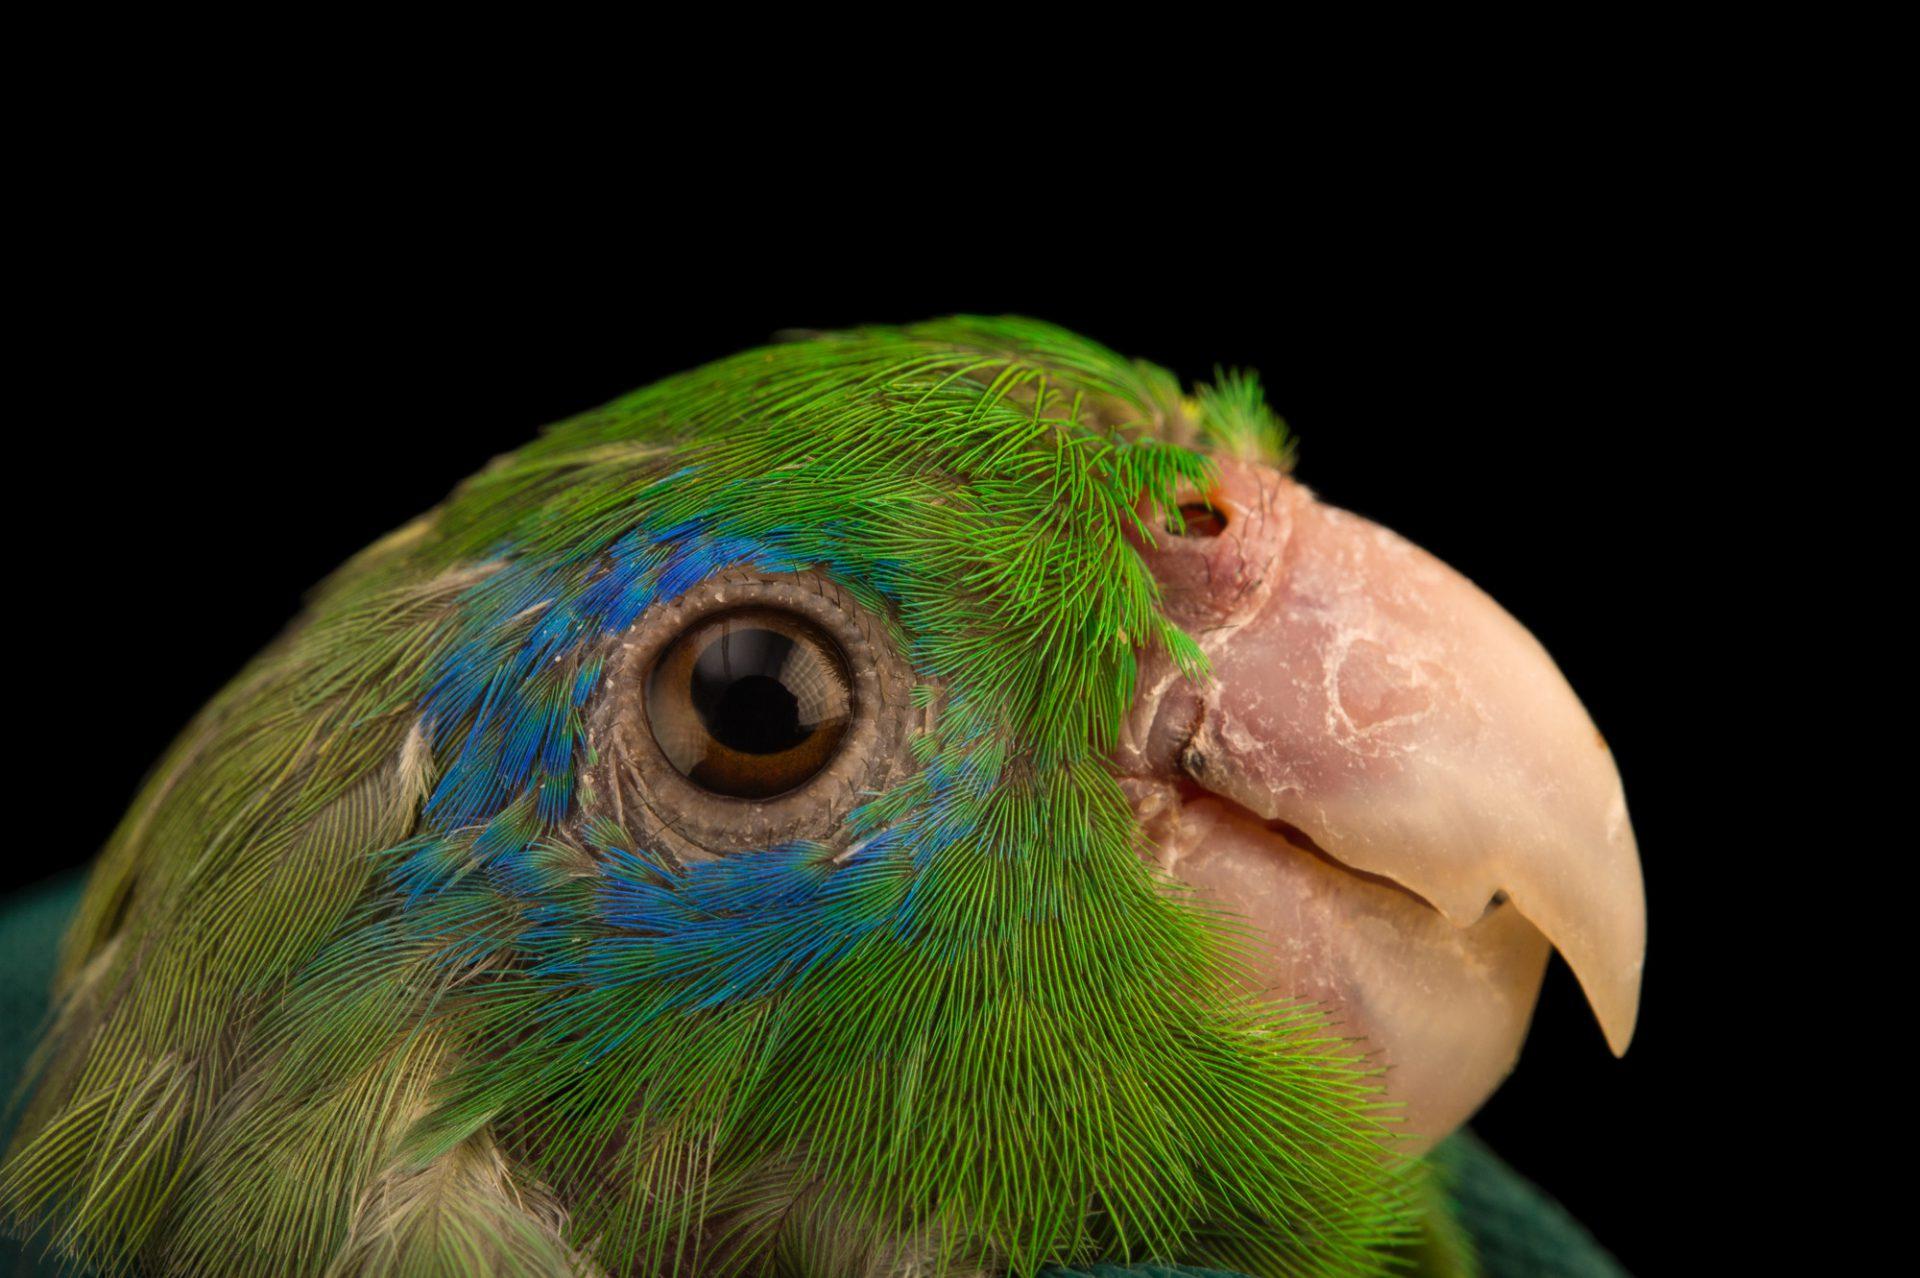 Photo: Spectacled parrotlet (Forpus conspicillatus) at Piscilago.